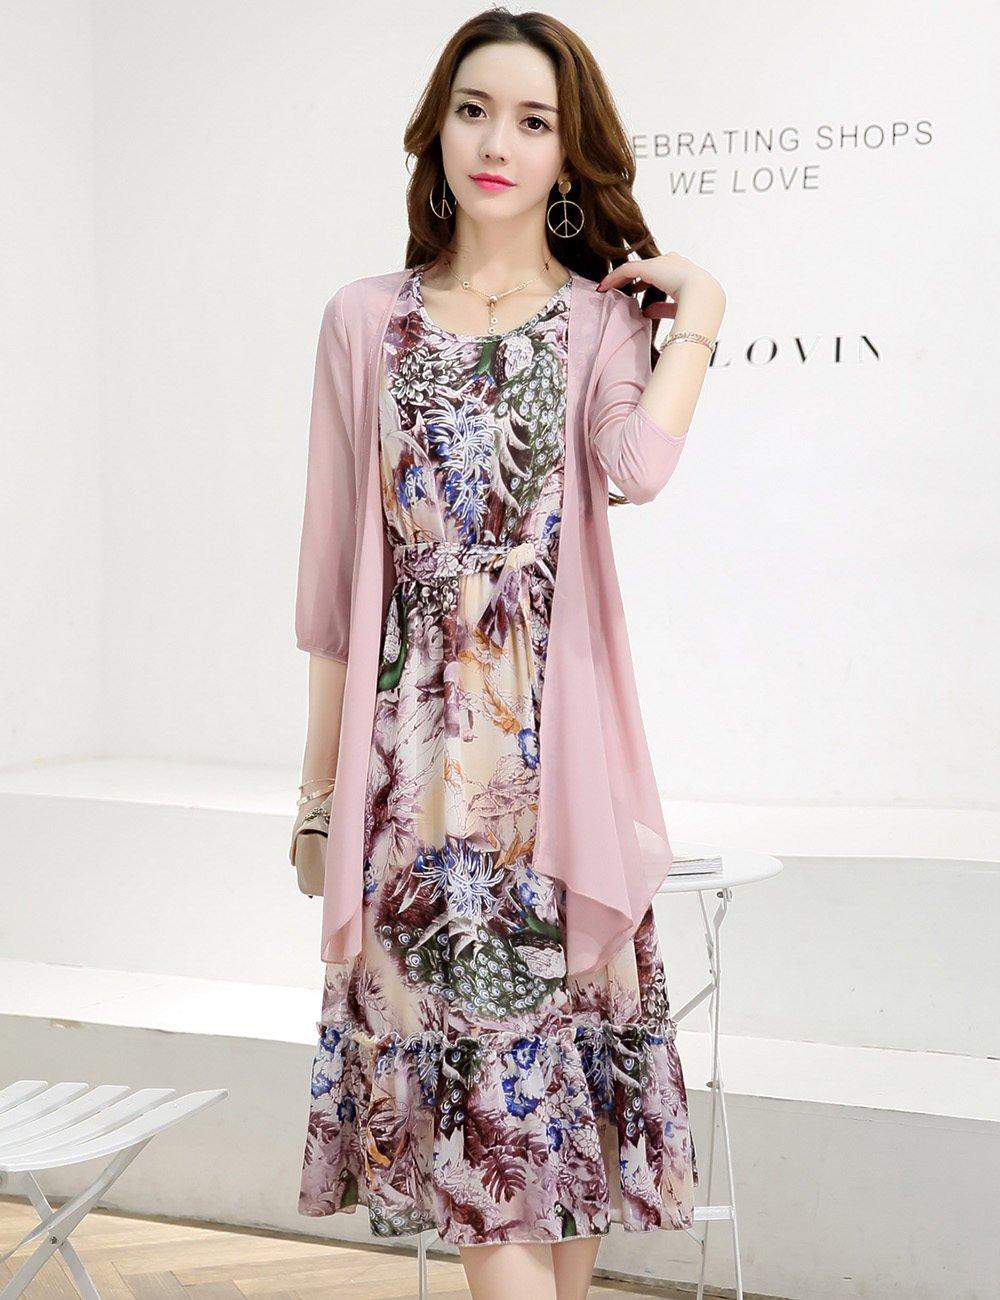 Fanru 梵如 女式 春季新款裙子女韩版修身印花两件套套装雪纺长袖连衣裙夏女中长款 F531-A801